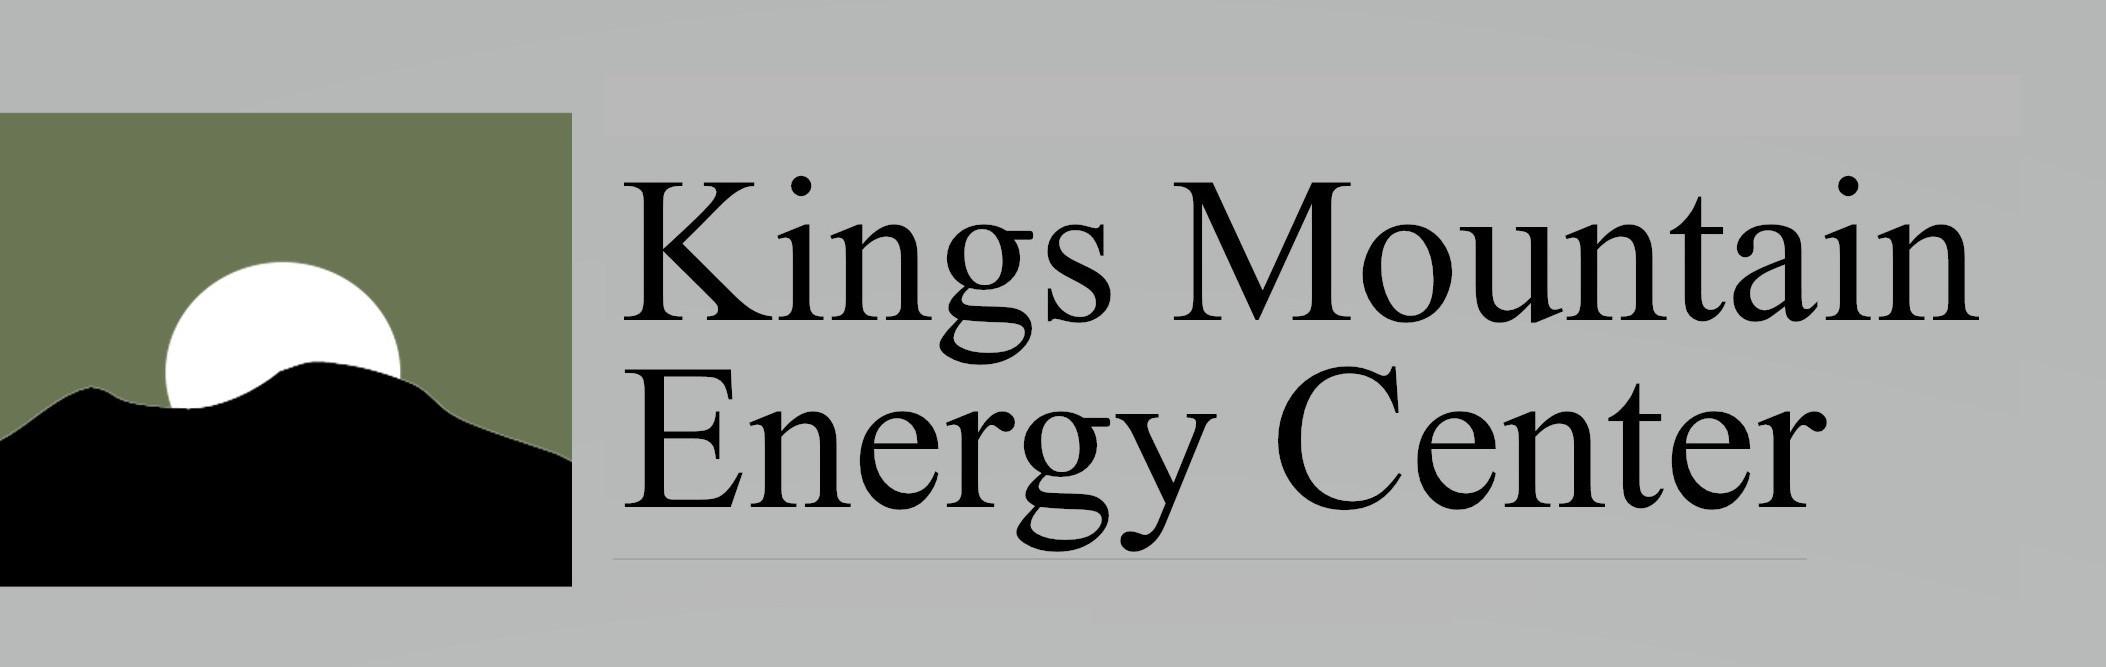 Kings Mountain Energy Center